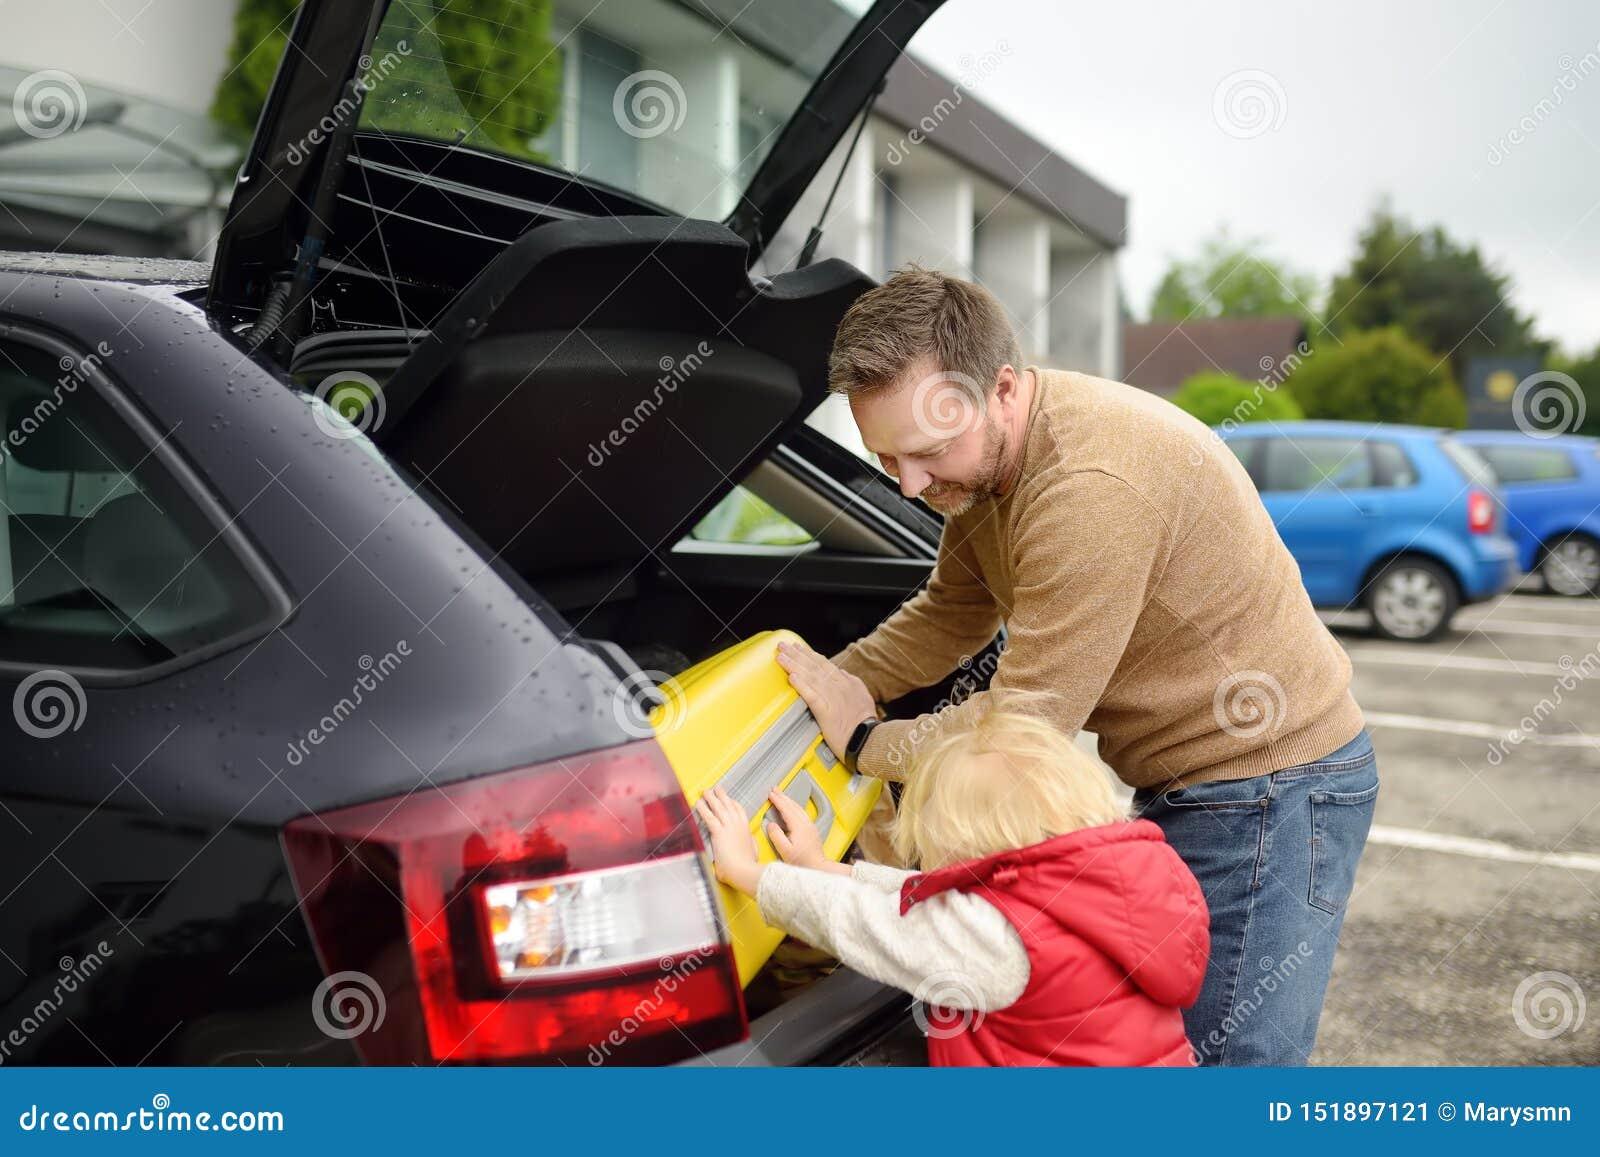 Knappe mens en zijn kleine zoon die naar vakanties gaan, die hun koffer in autoboomstam laden Automobiele reis in het platteland